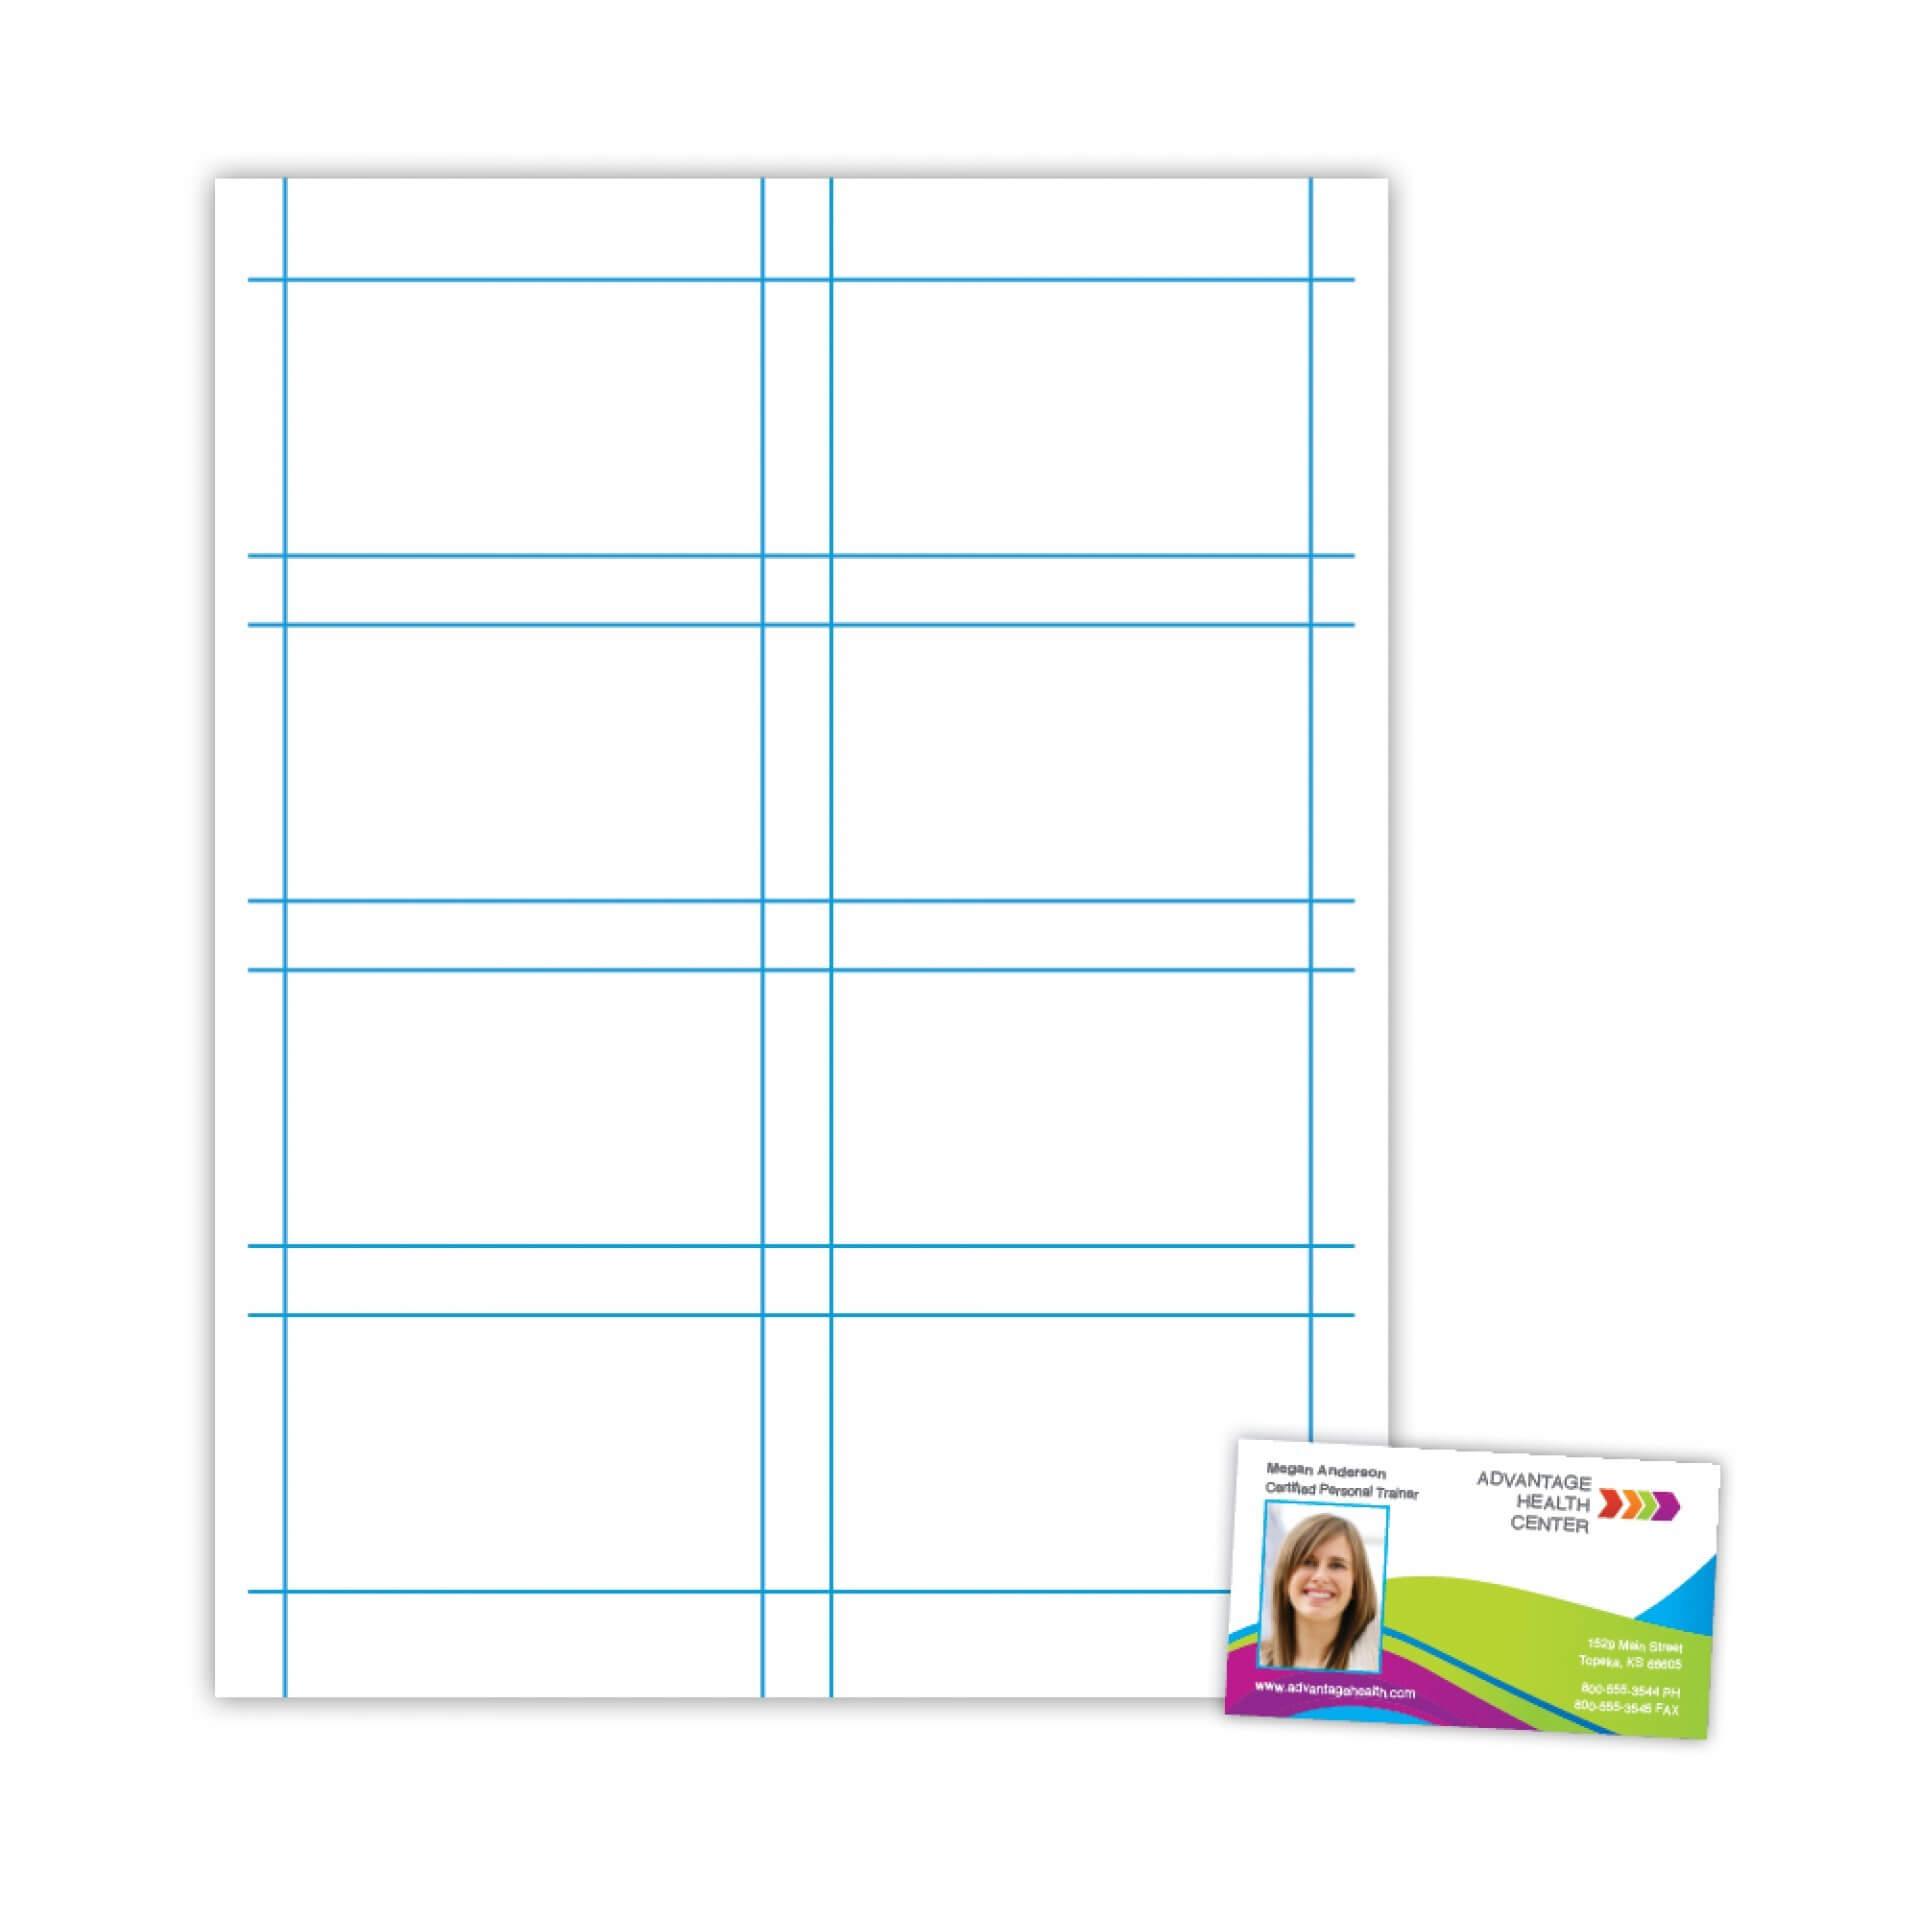 025 Plain Business Card Template Blank Microsoft Word Free For Plain Business Card Template Microsoft Word